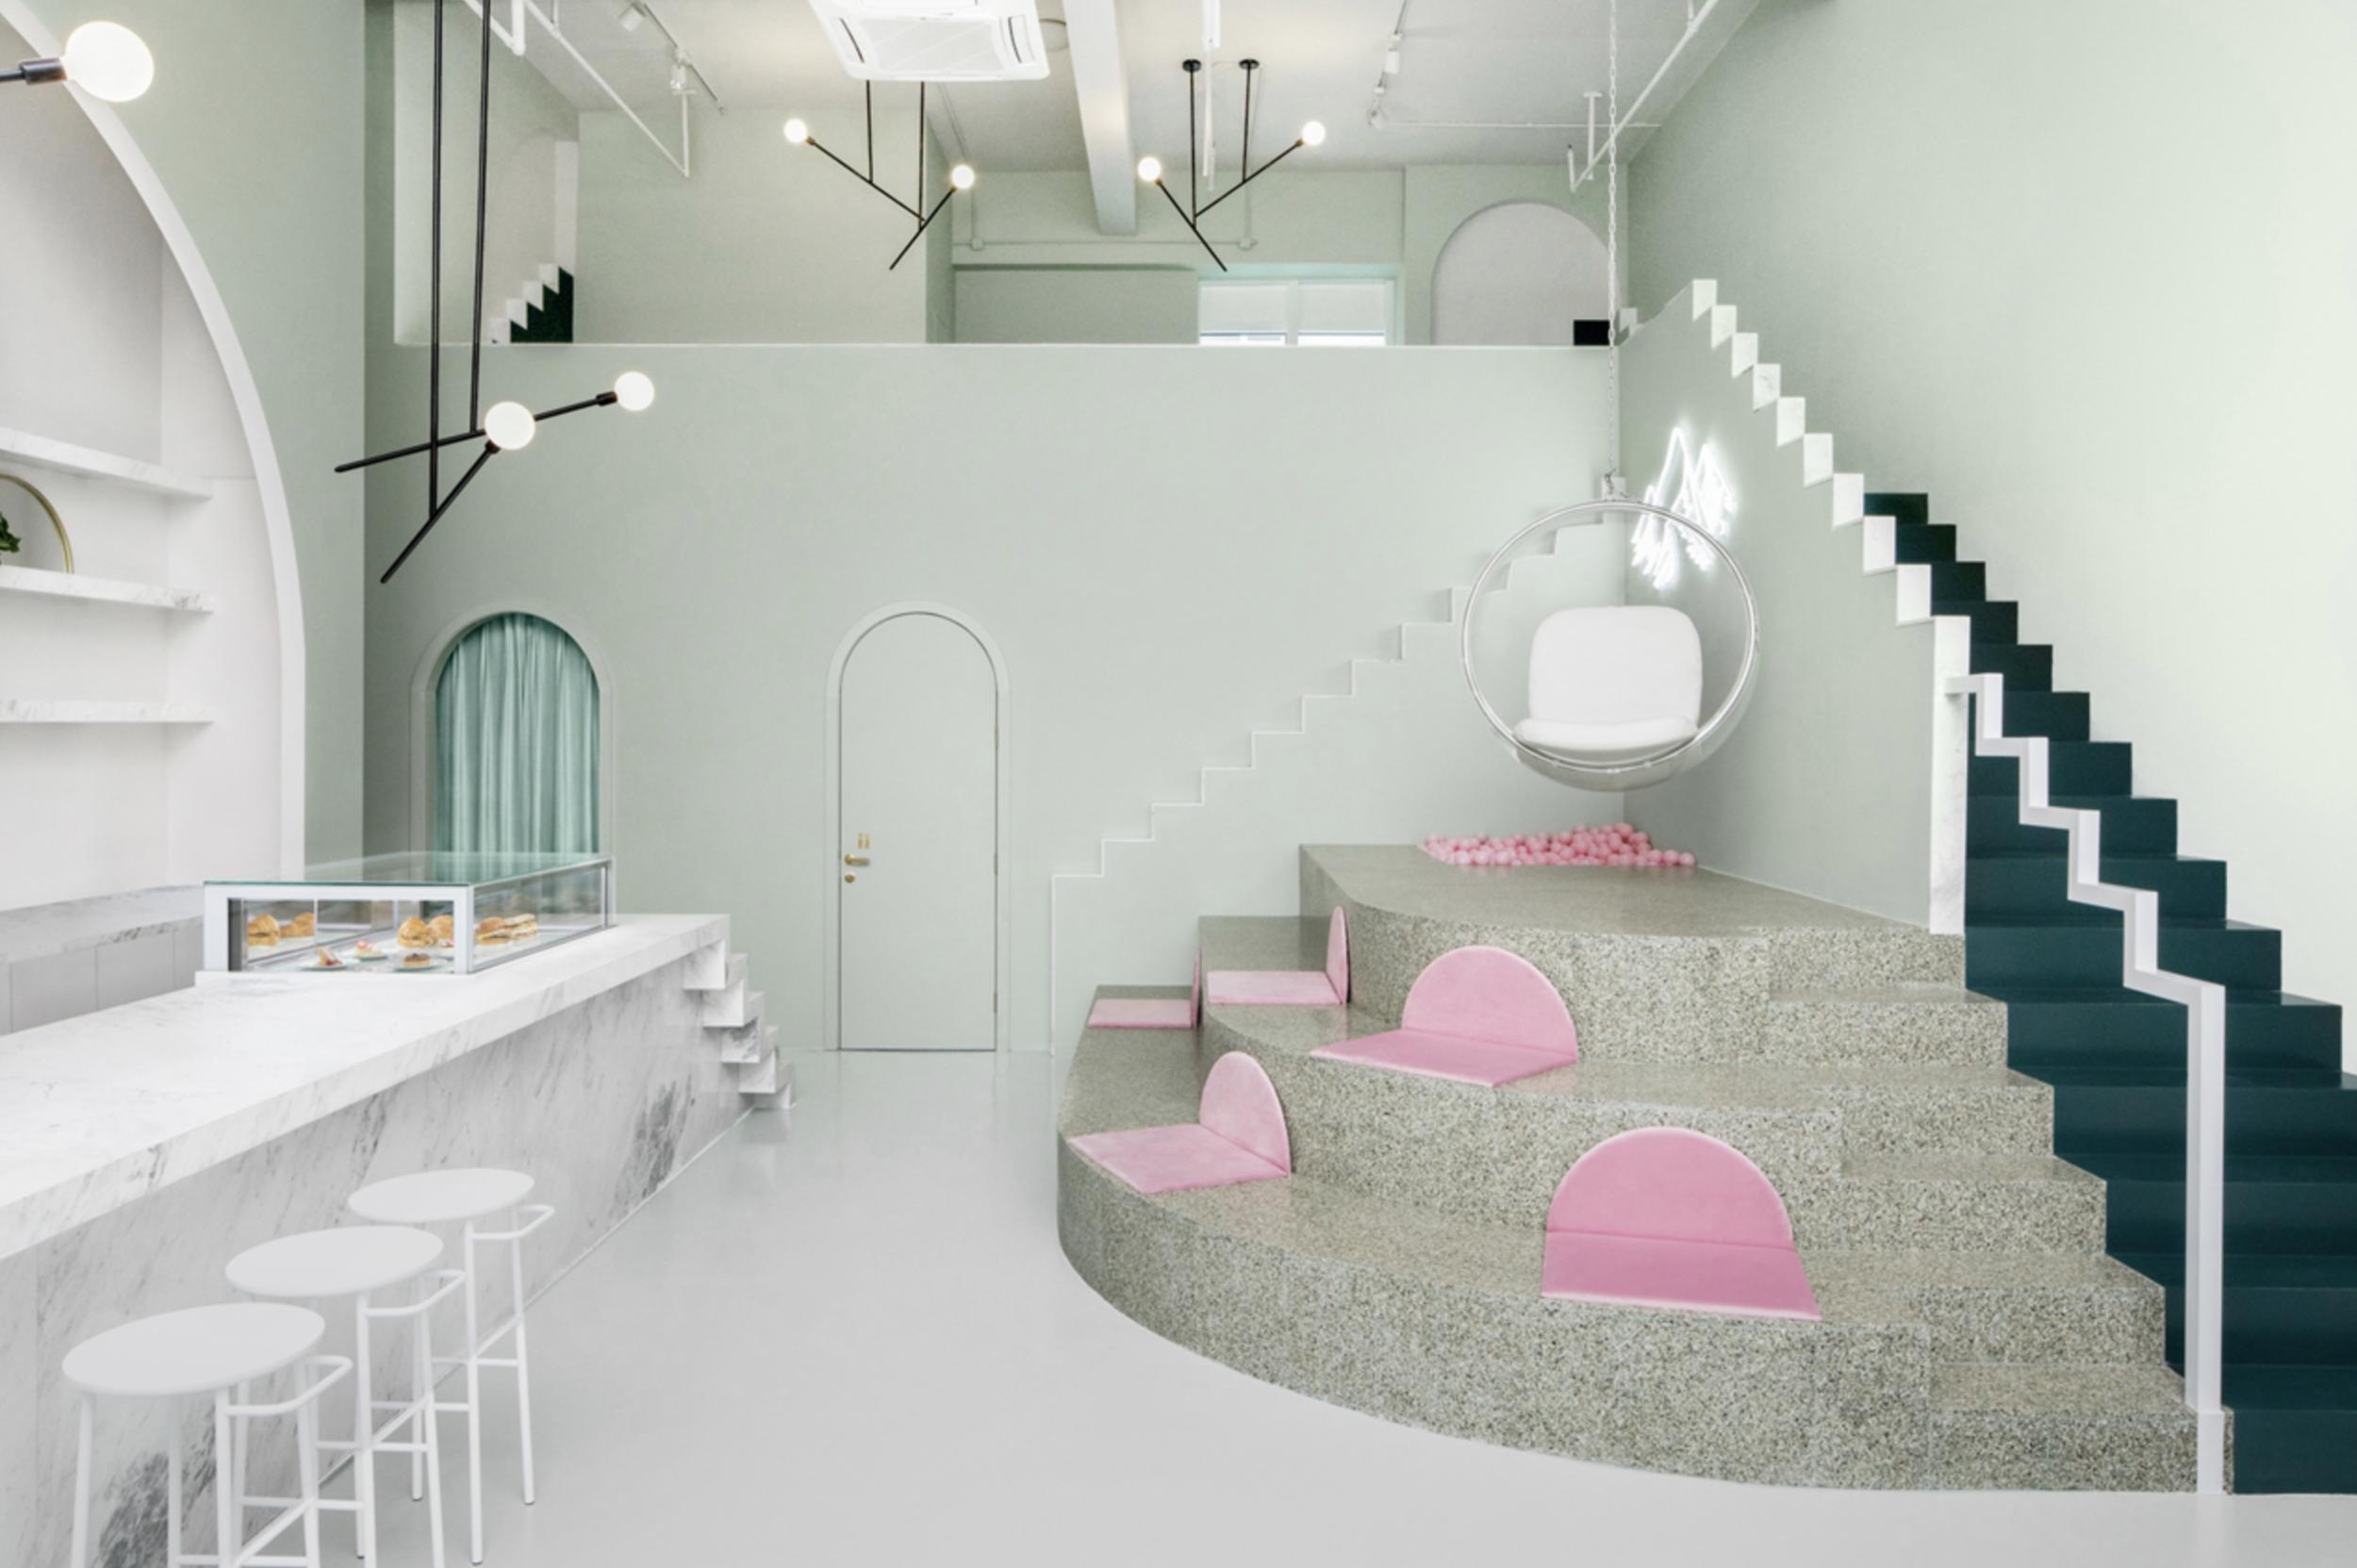 Interior design by BIASOL / photography by James Morgan